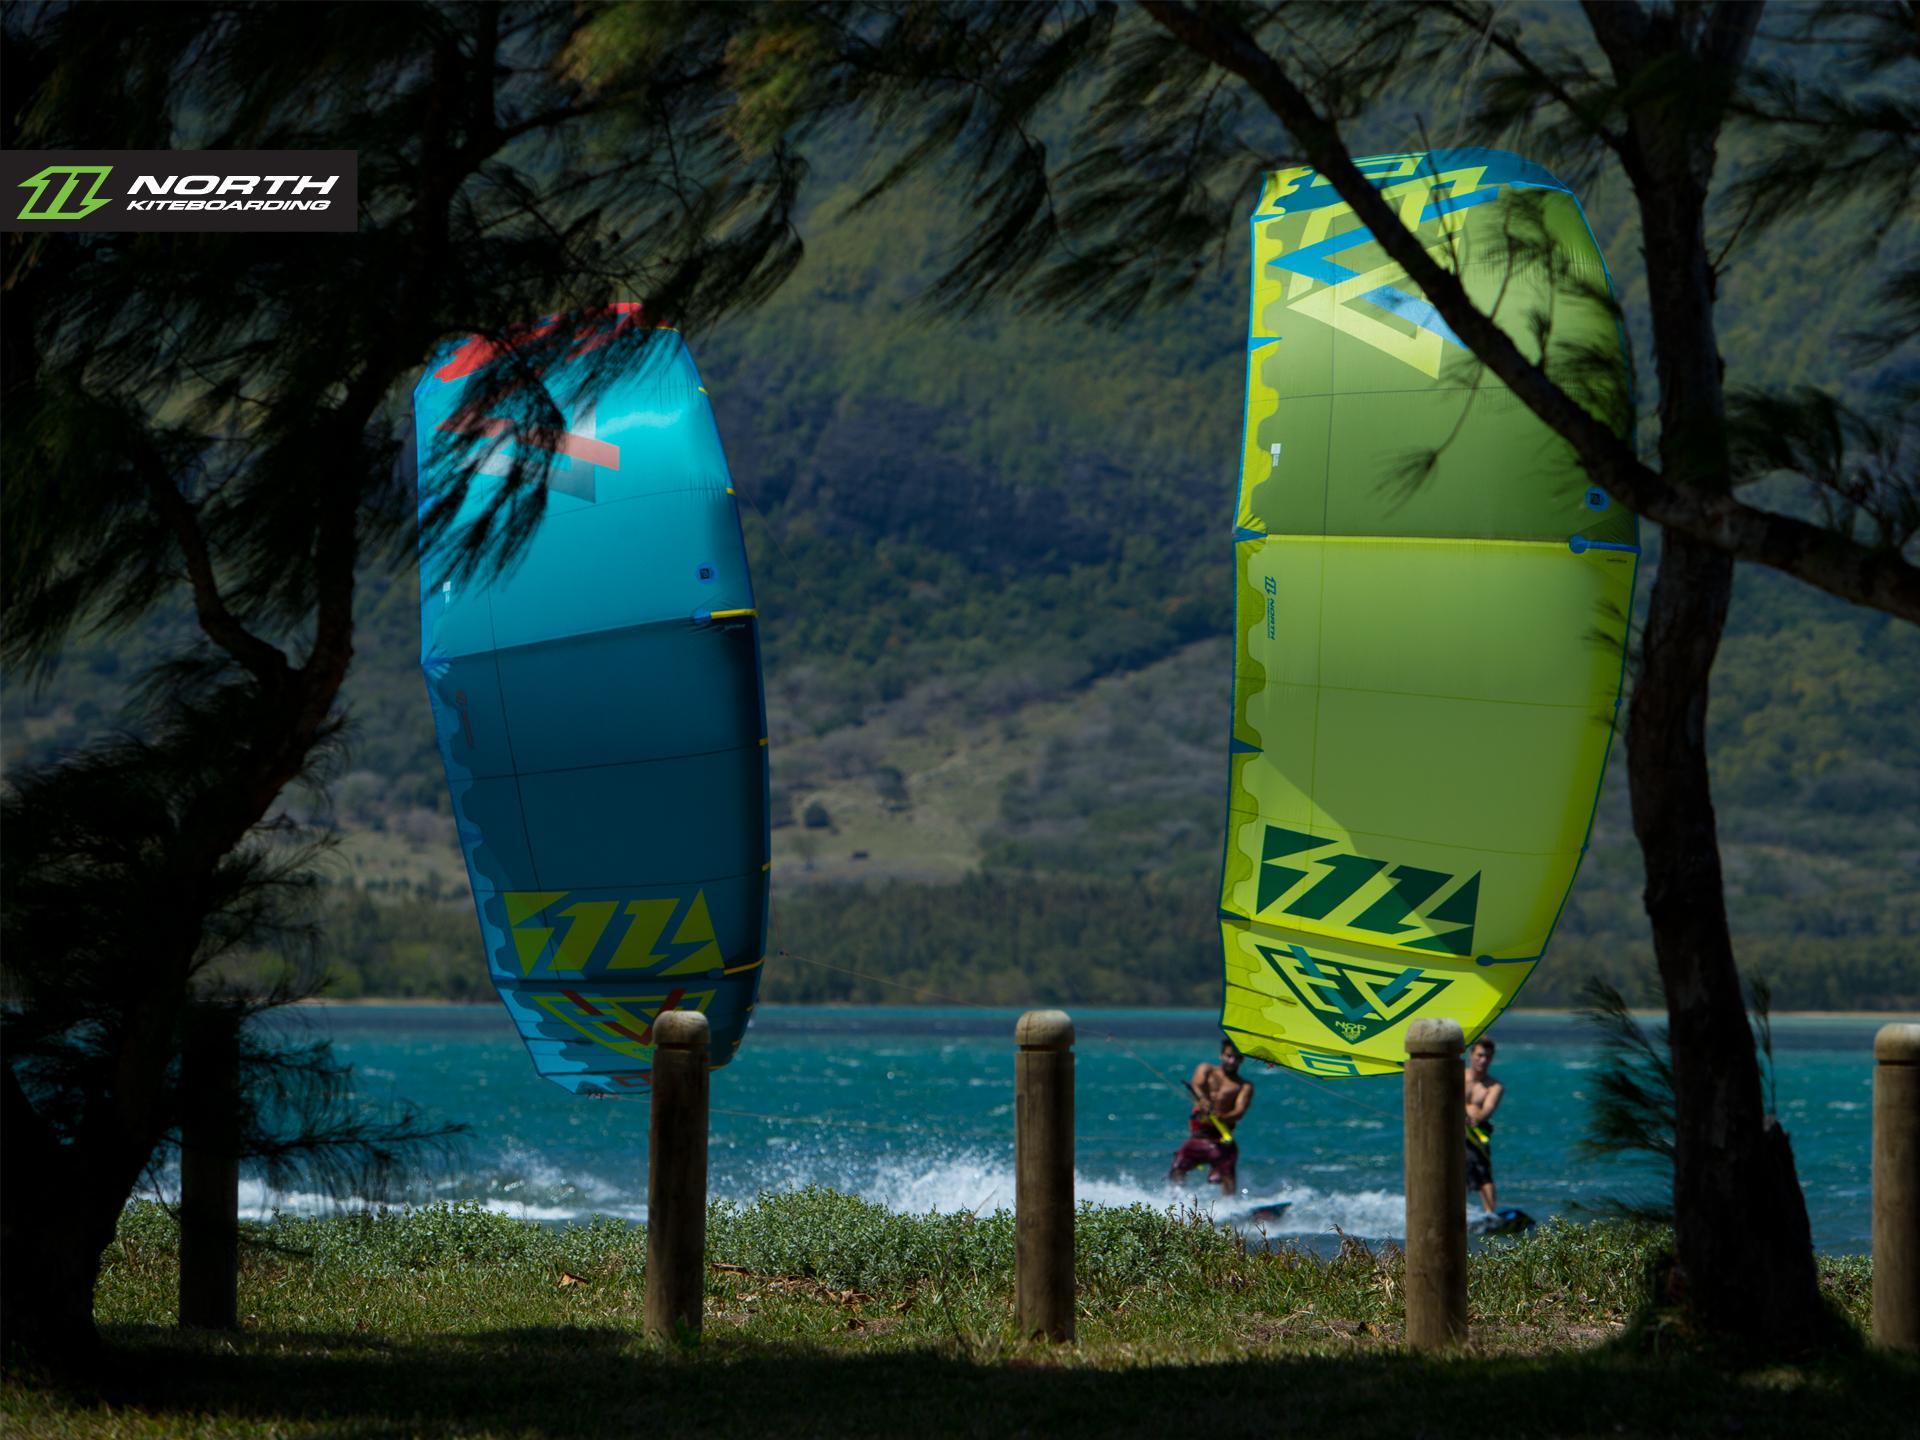 kitesurf wallpaper image - North Evo 2015 duo cruising between the trees - kitesurfing - in resolution: Standard 4:3 1920 X 1440